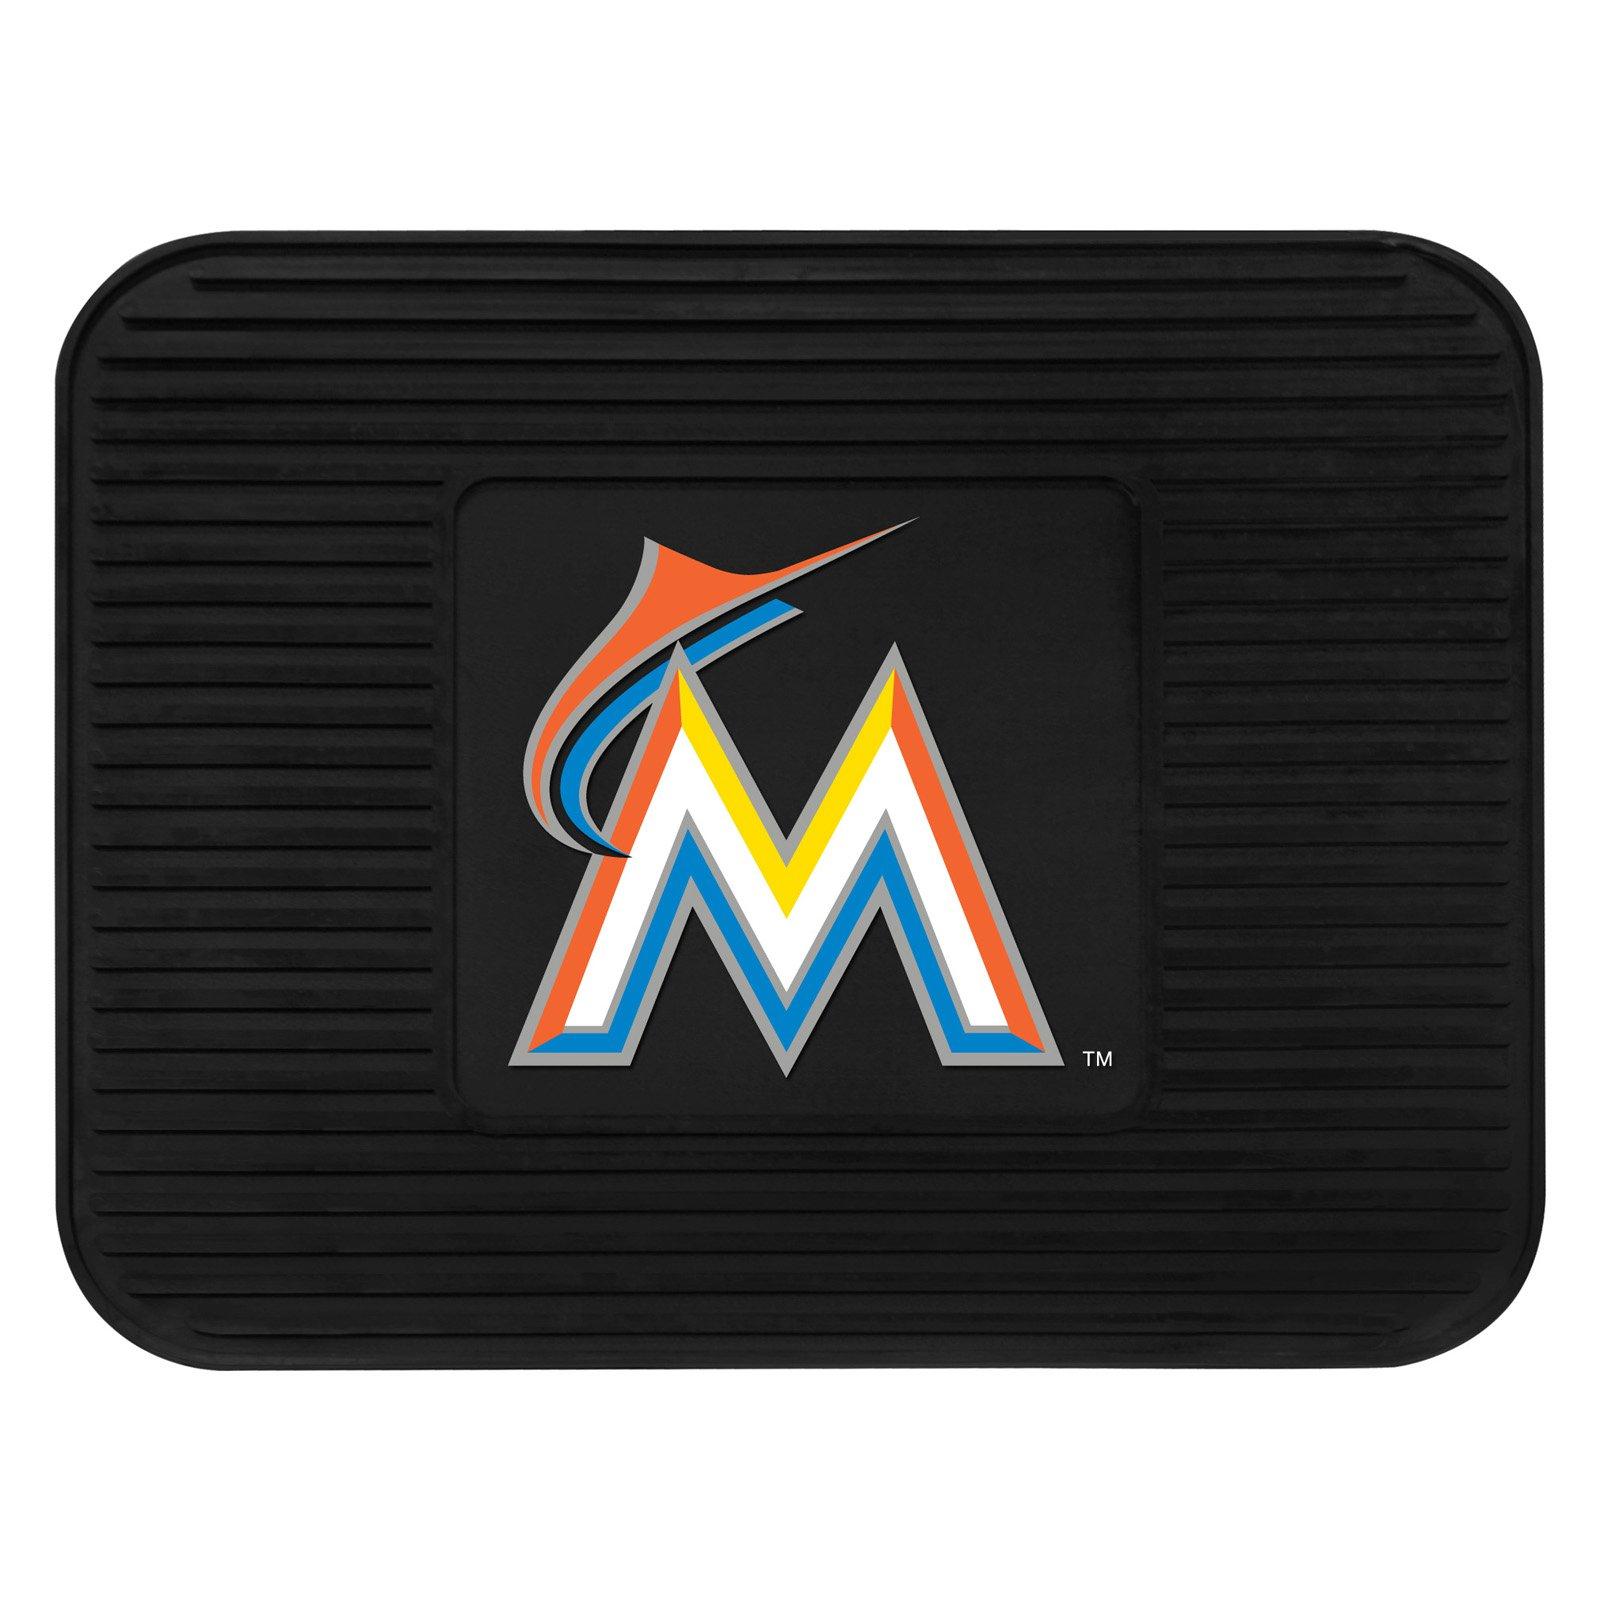 FANMATS MLB Novelty Utility Mat